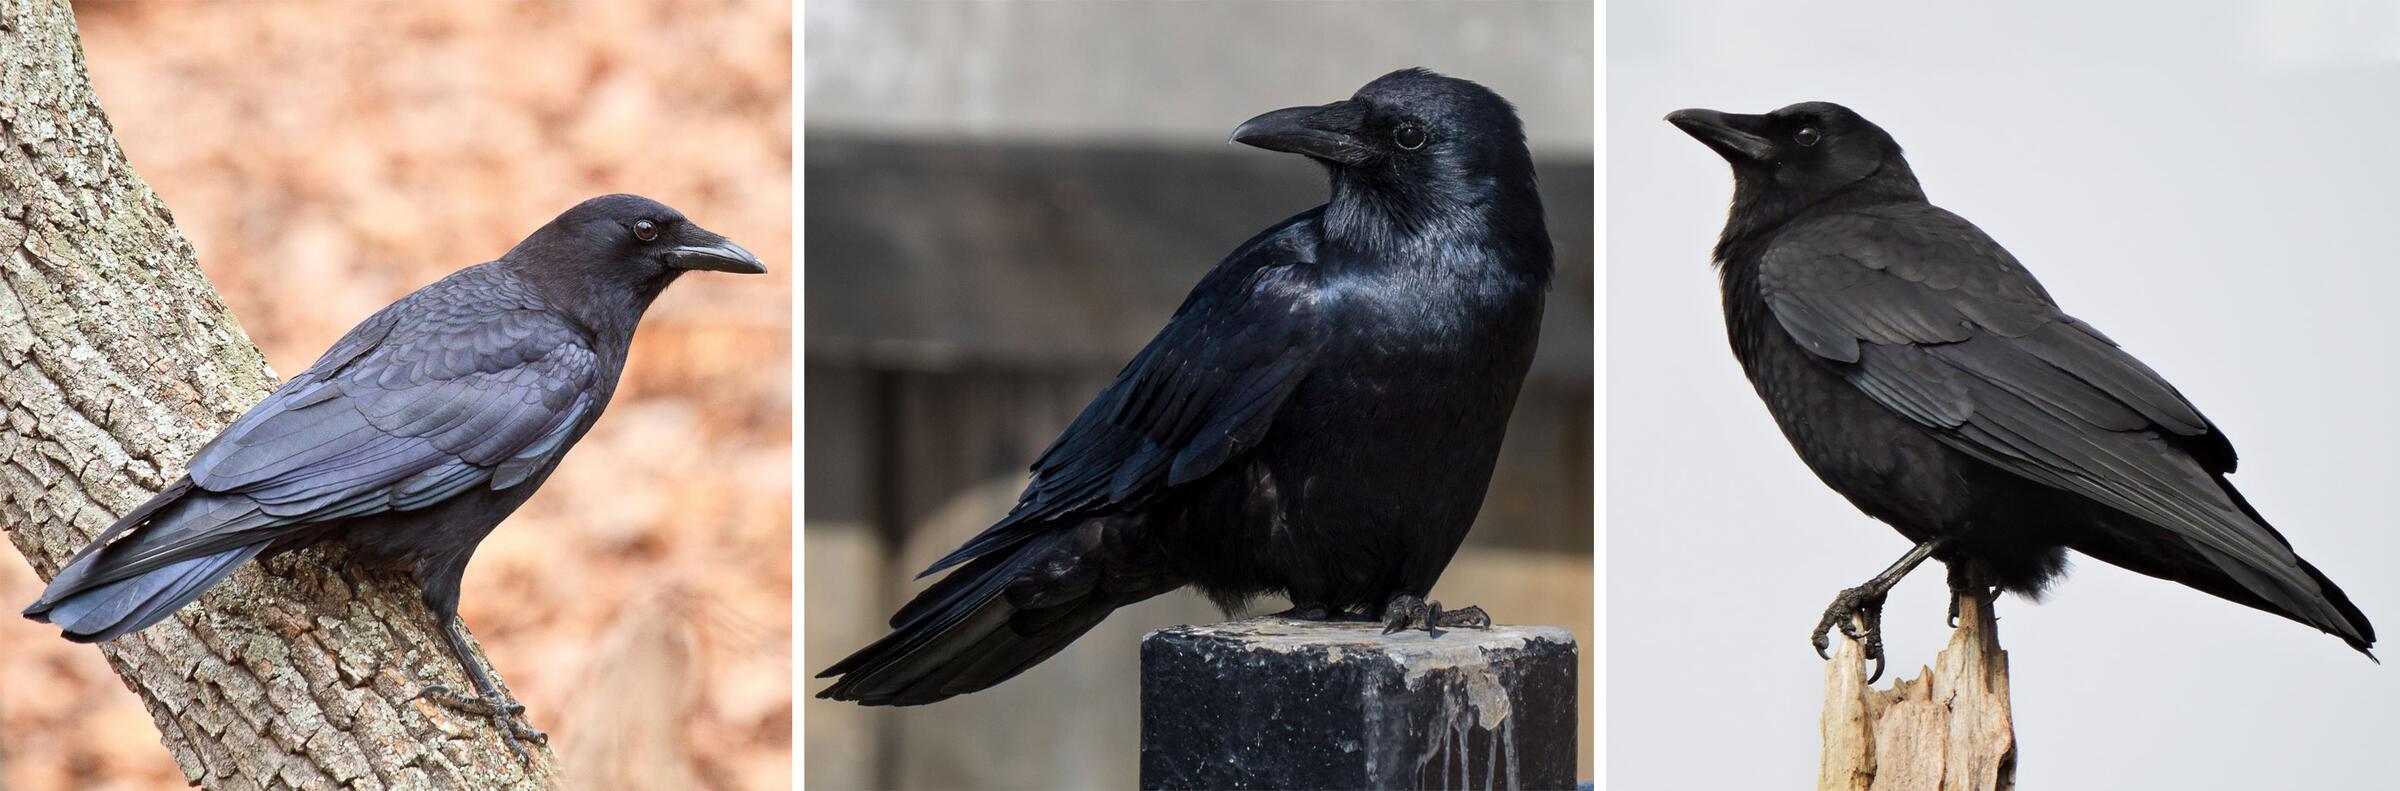 From left: American Crow. Photo: Paul Powers/Great Backyard Bird Count; Fish Crow. Photo: RW Sinclair/Flickr (CC BY-NC-SA 2.0); Northwestern Crow. Photo: Meryle Ardagh/Great Backyard Bird Count